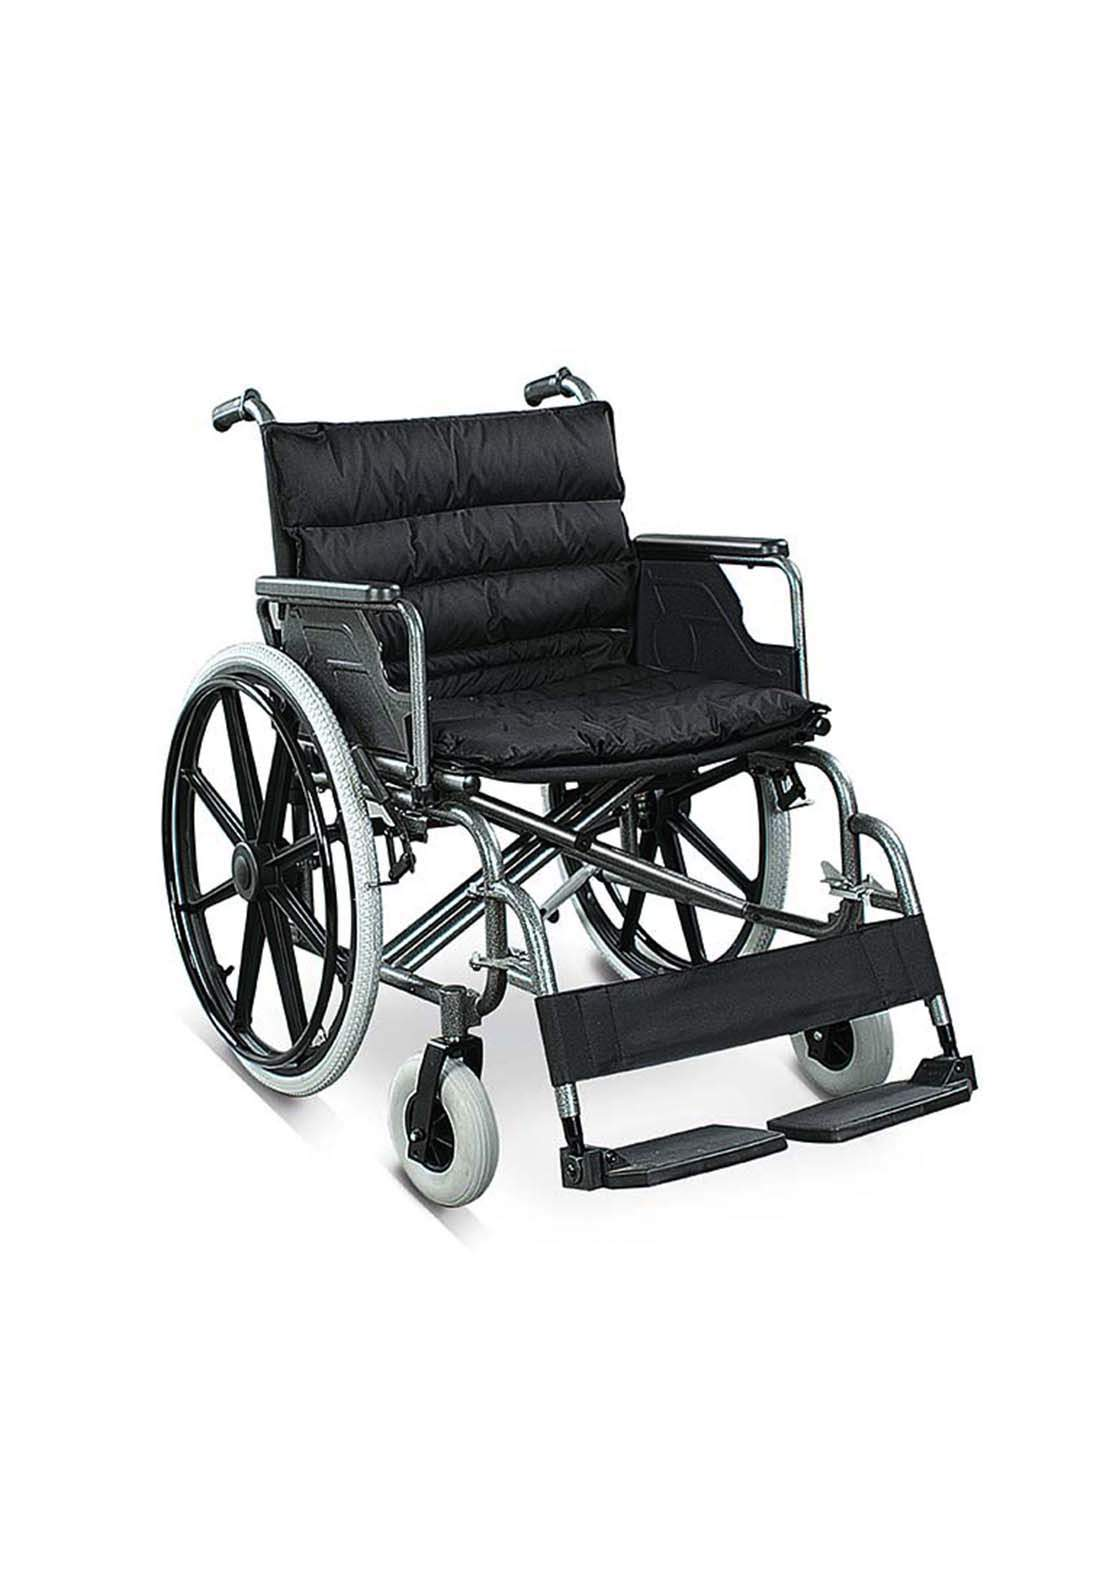 Foshan Fs 951 Wheel Chair  B-56  كرسي متحرك